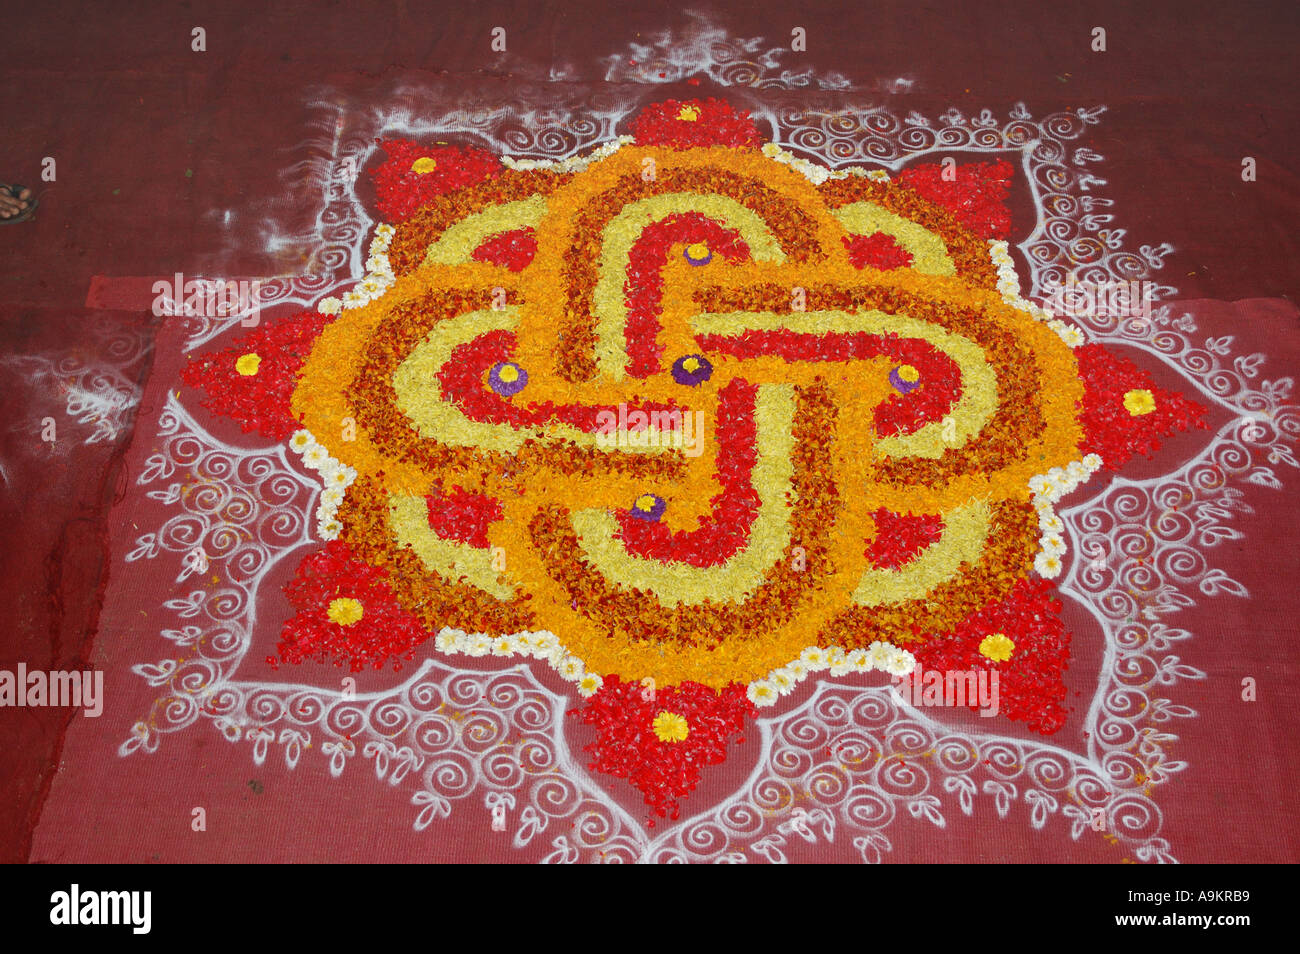 ANG99307 Indian Festival Auspicious Door Entrance Flower Decoration On Floor Called Rangoli During Diwali Onam Pongal India